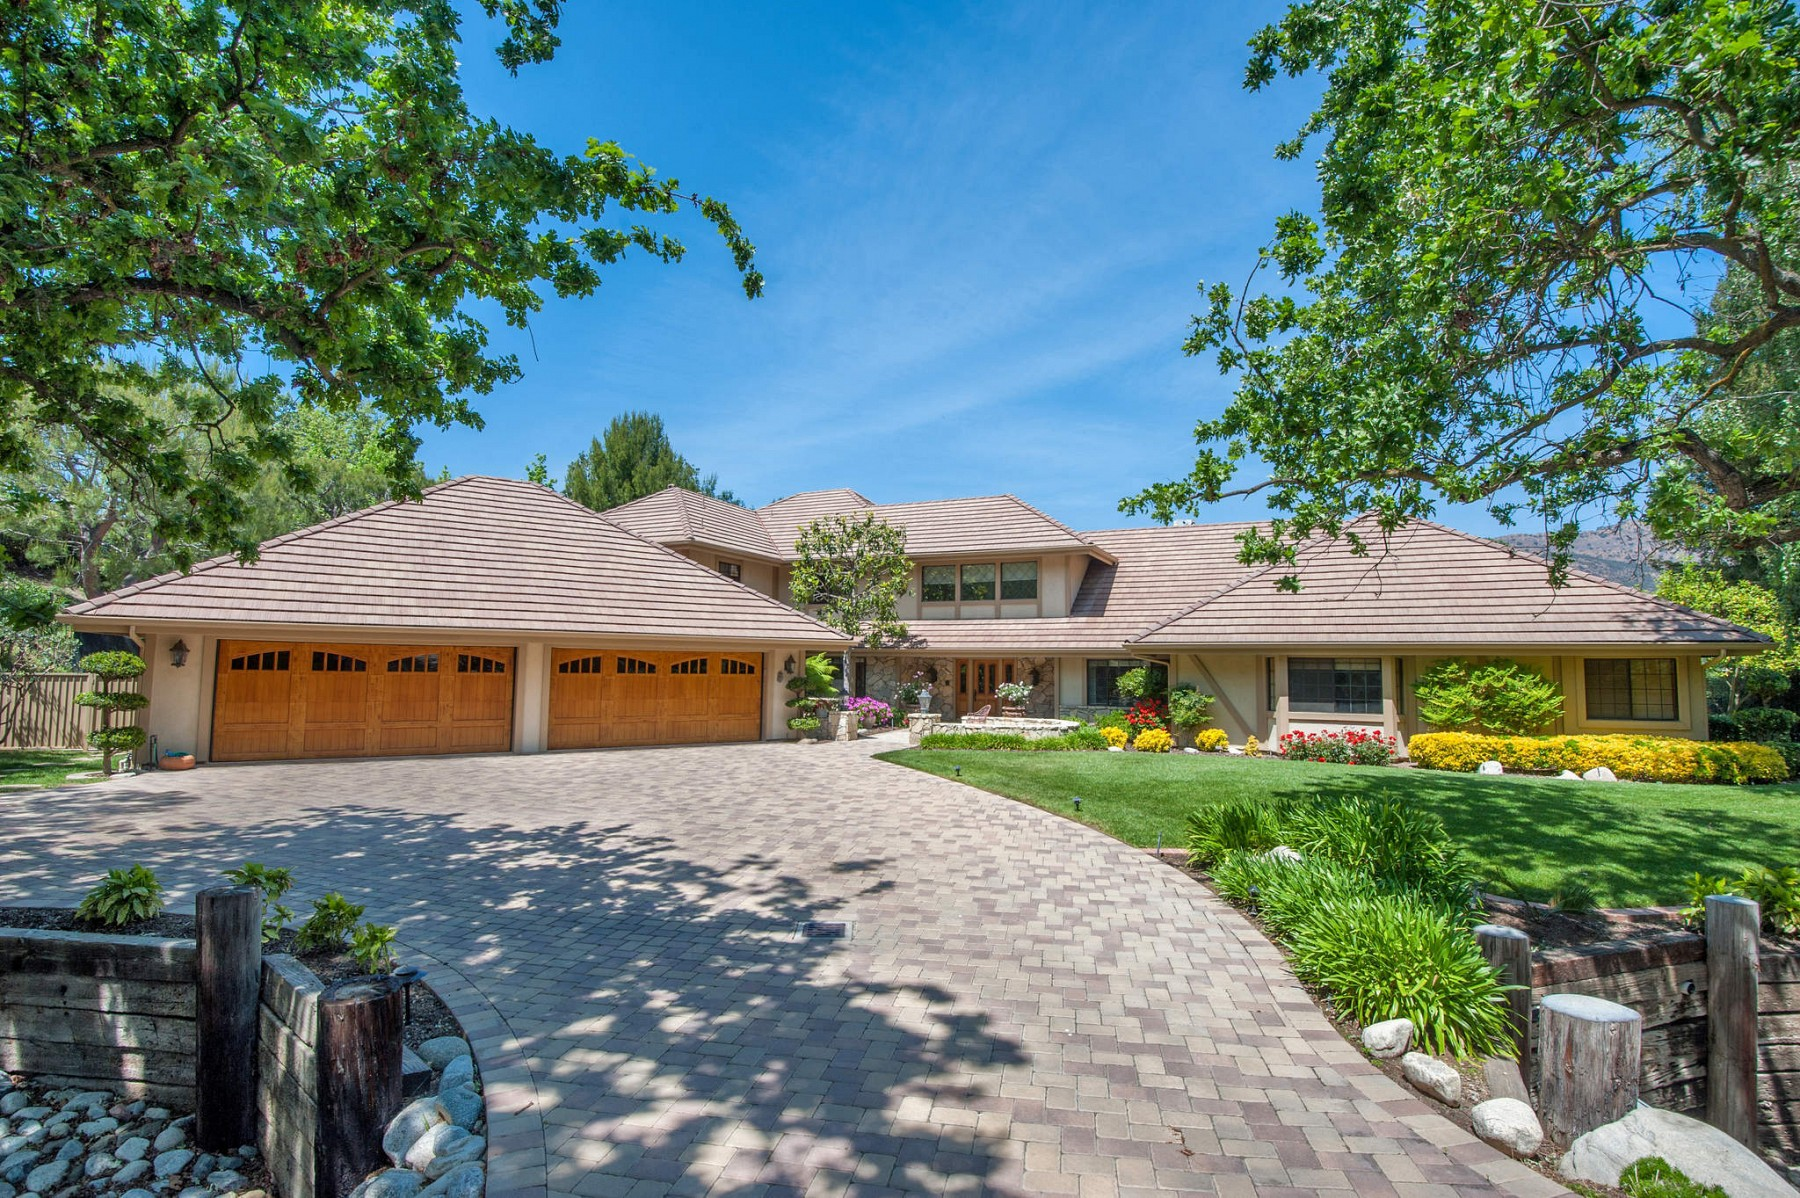 4983 Lakeview Canyon Road, Westlake Village, CA 91362